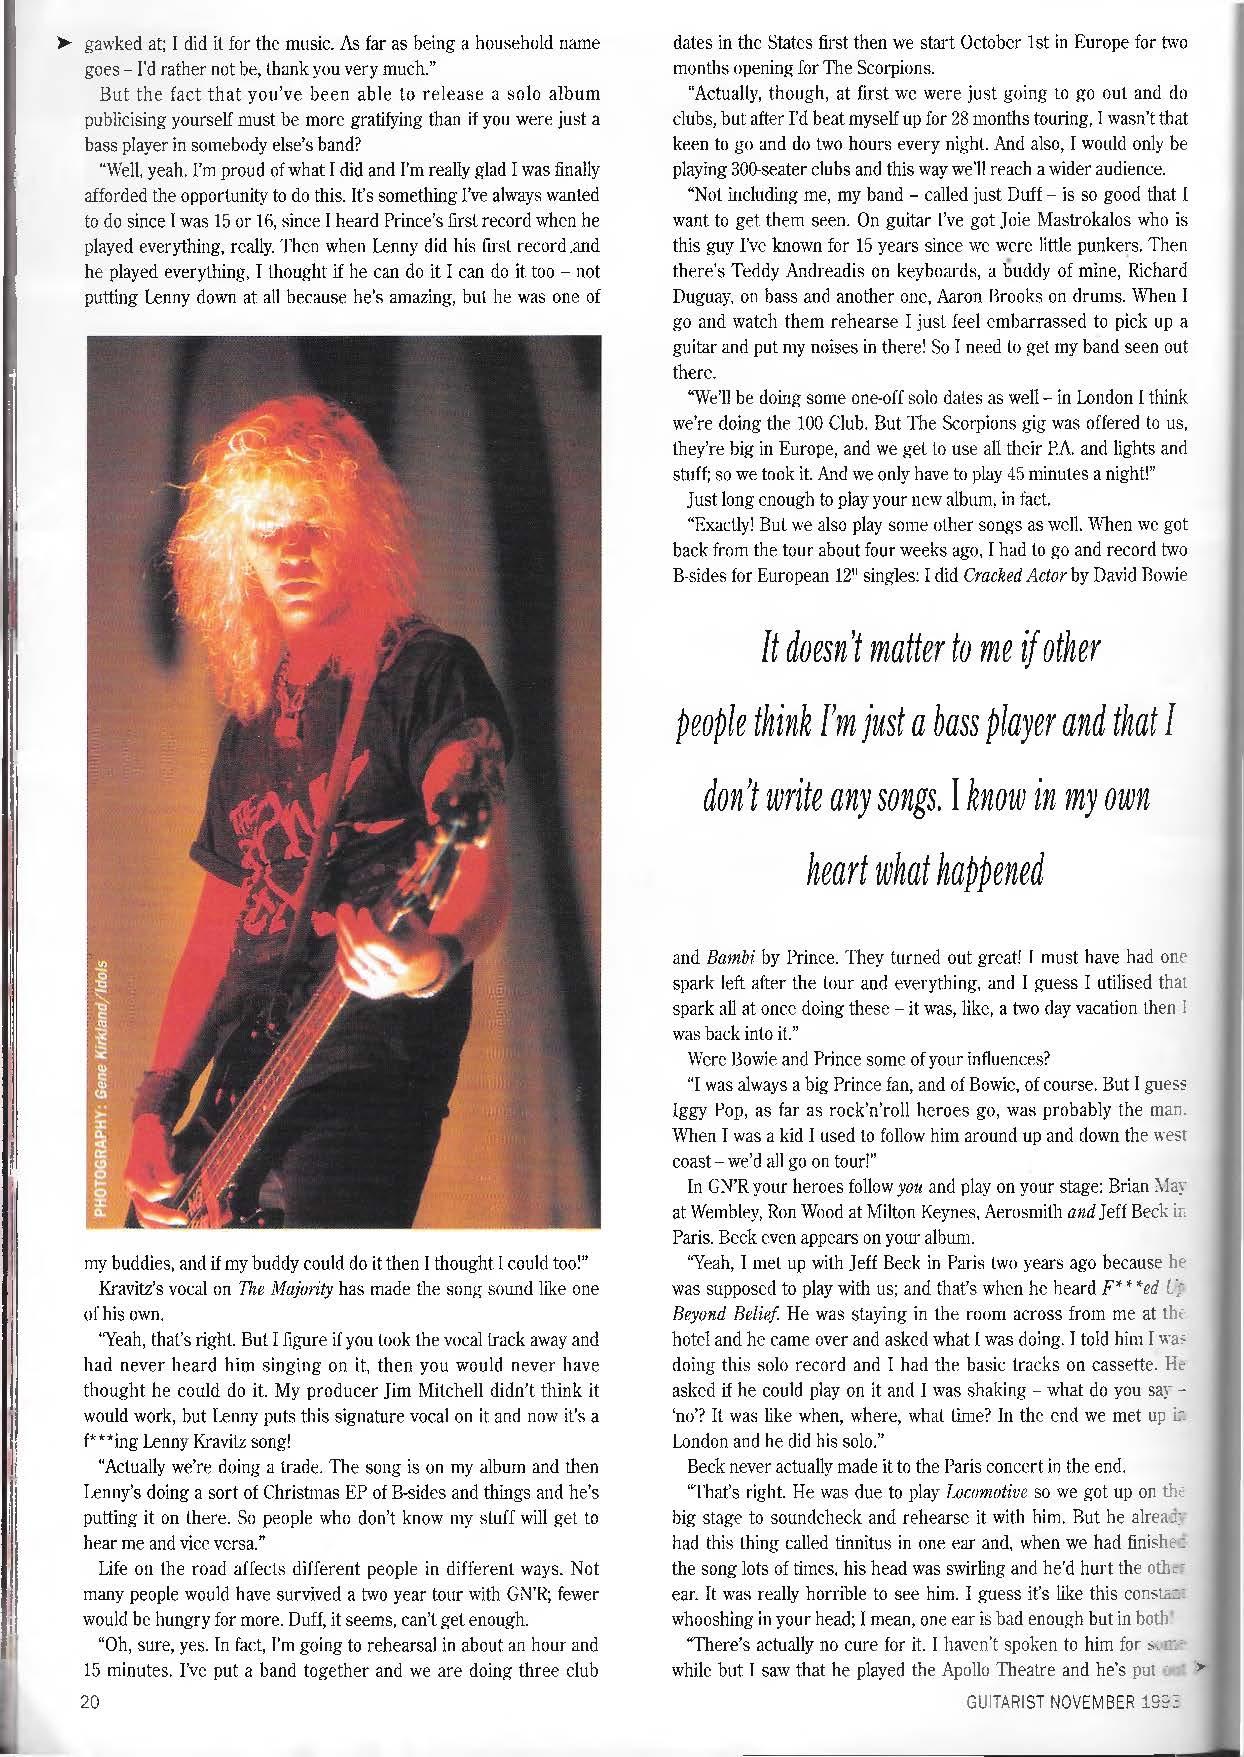 1993.11.DD - Guitarist Magazine - Loose Cannon (Duff) 1GJdsbJY_o